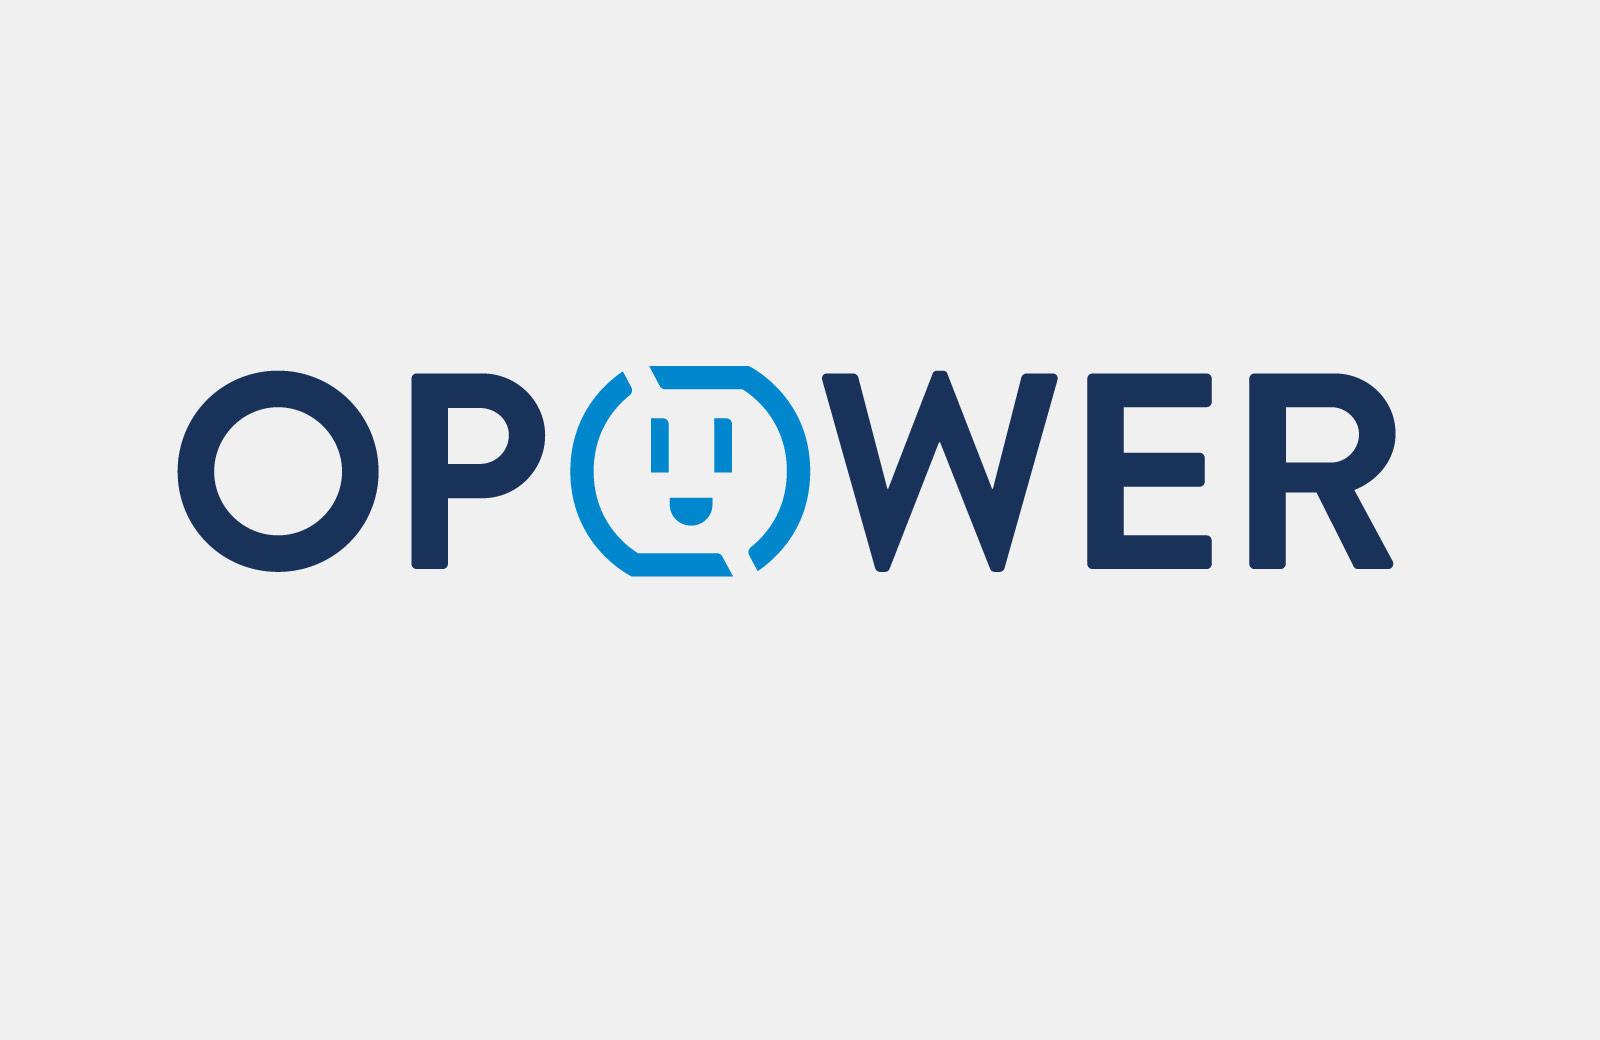 opower-logo.jpg